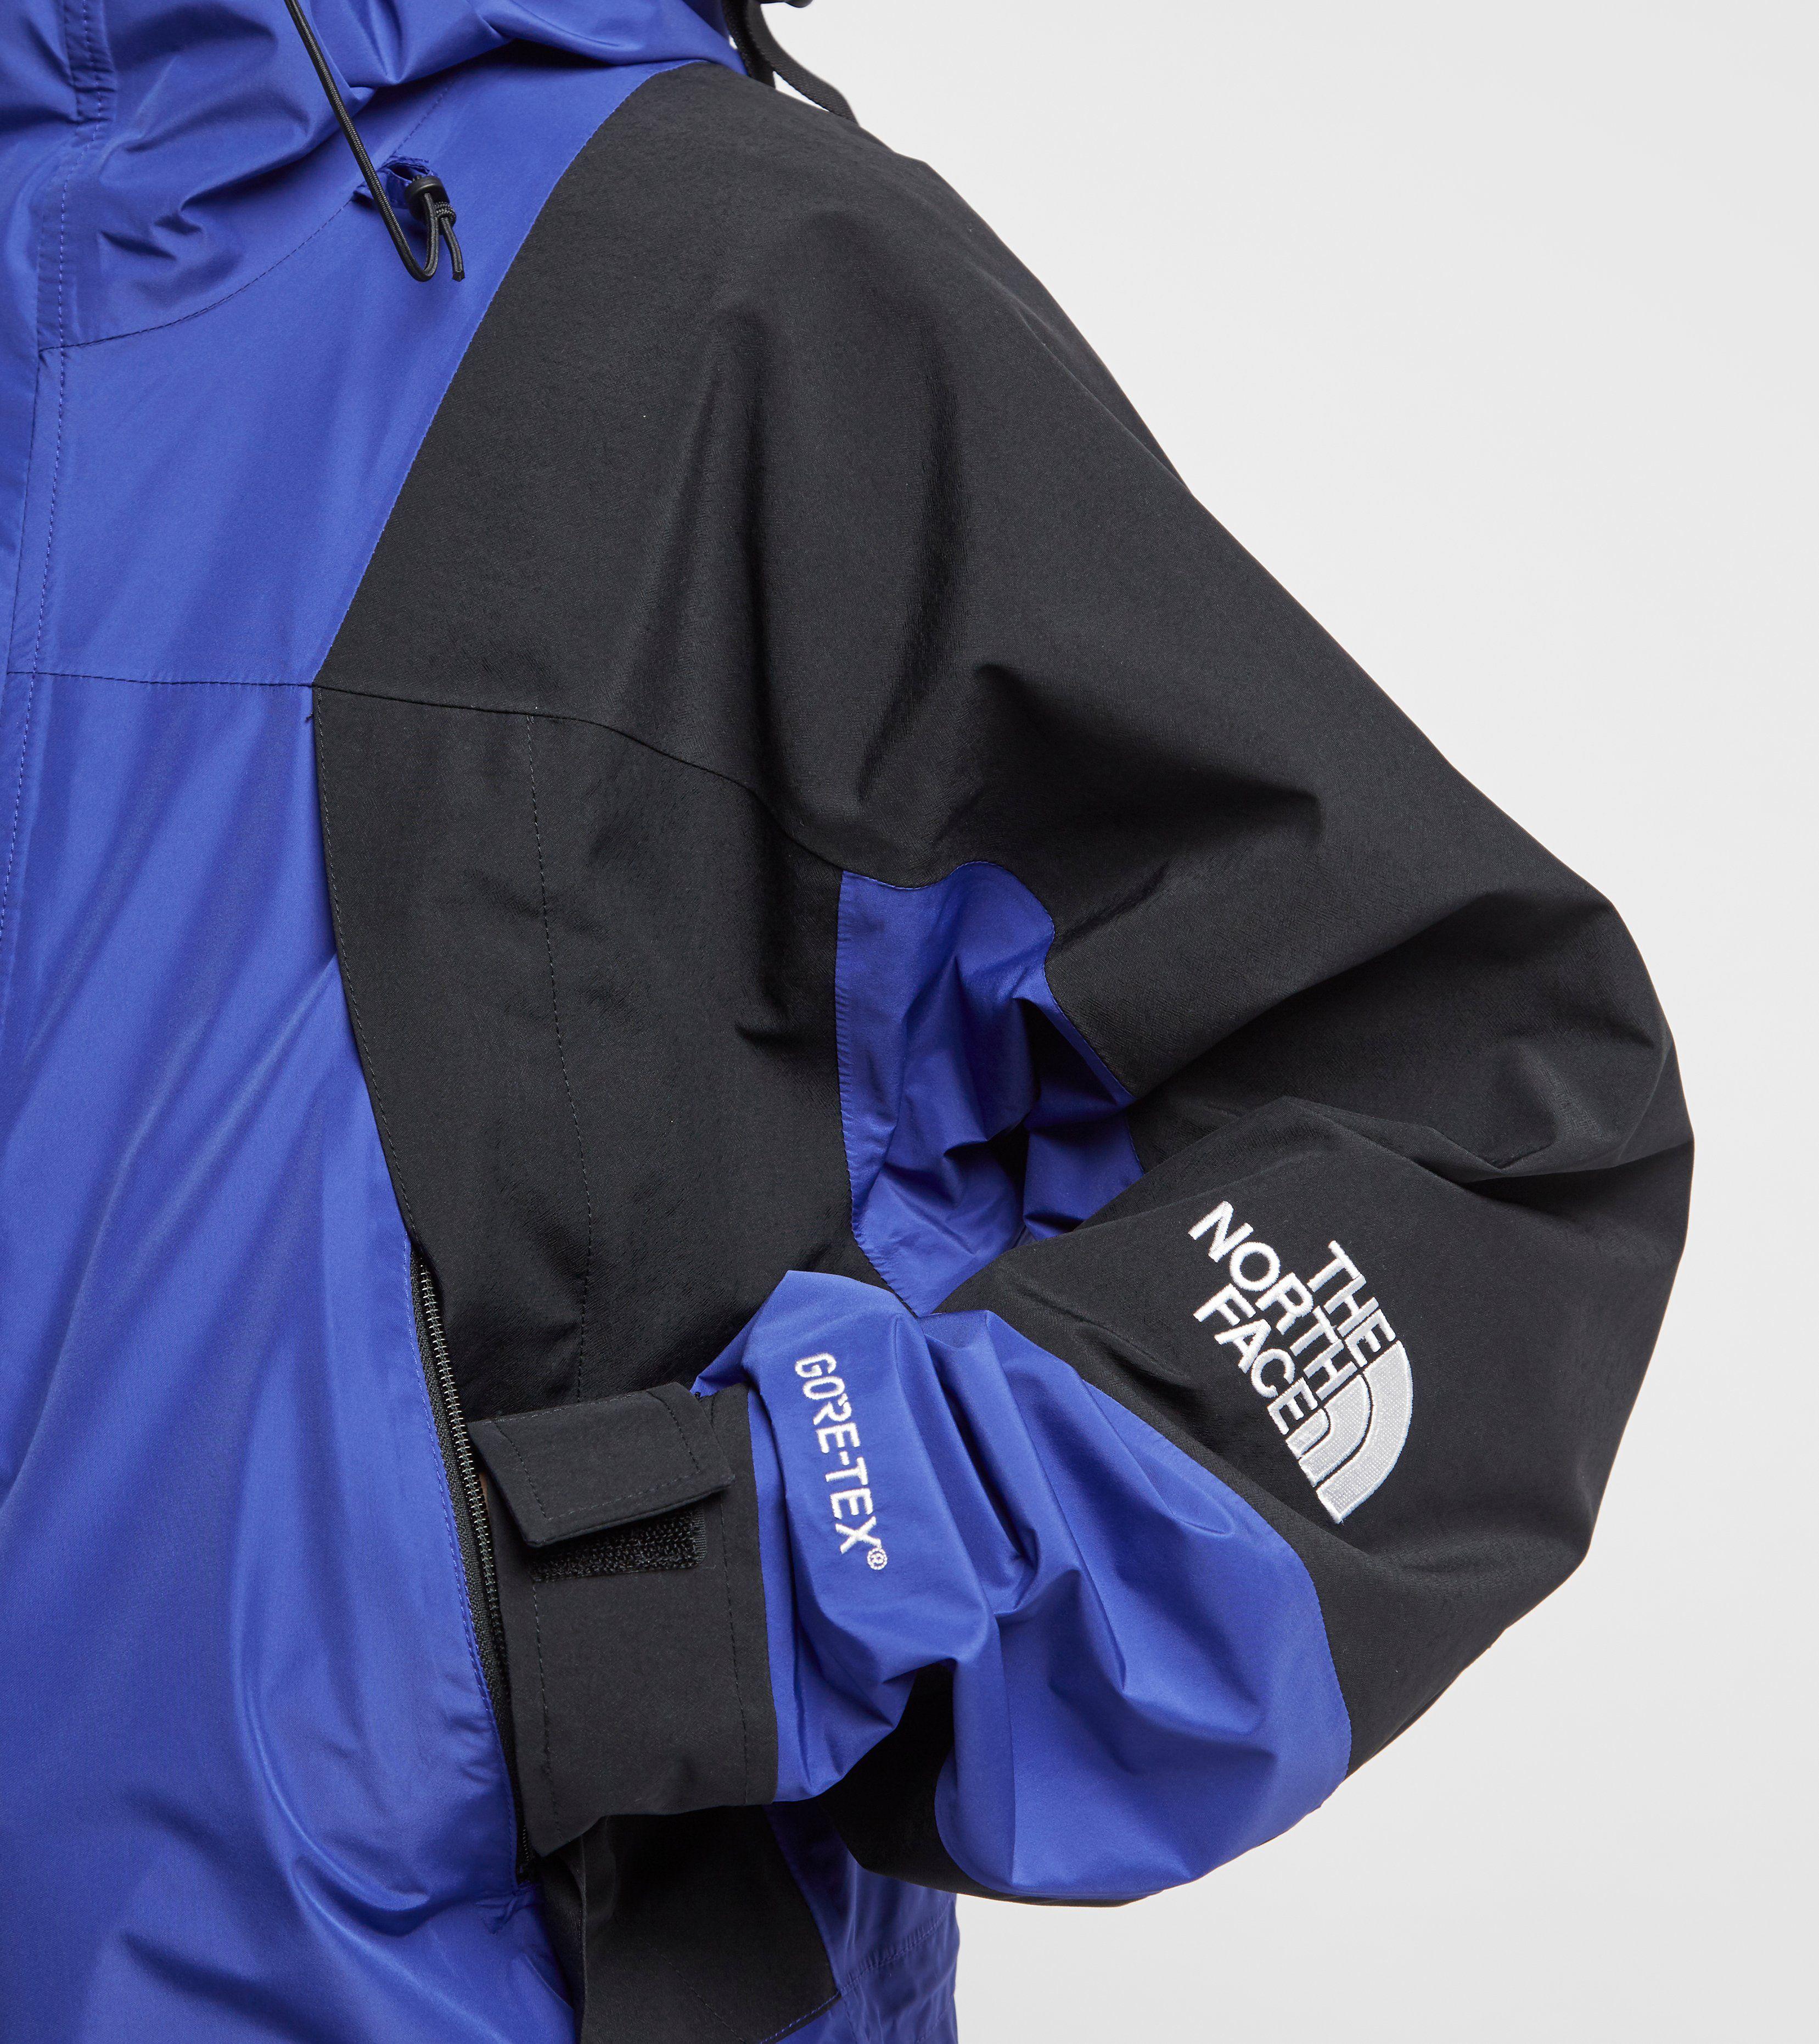 The North Face 1994 Retro Mountain Light GORE-TEX Jacket